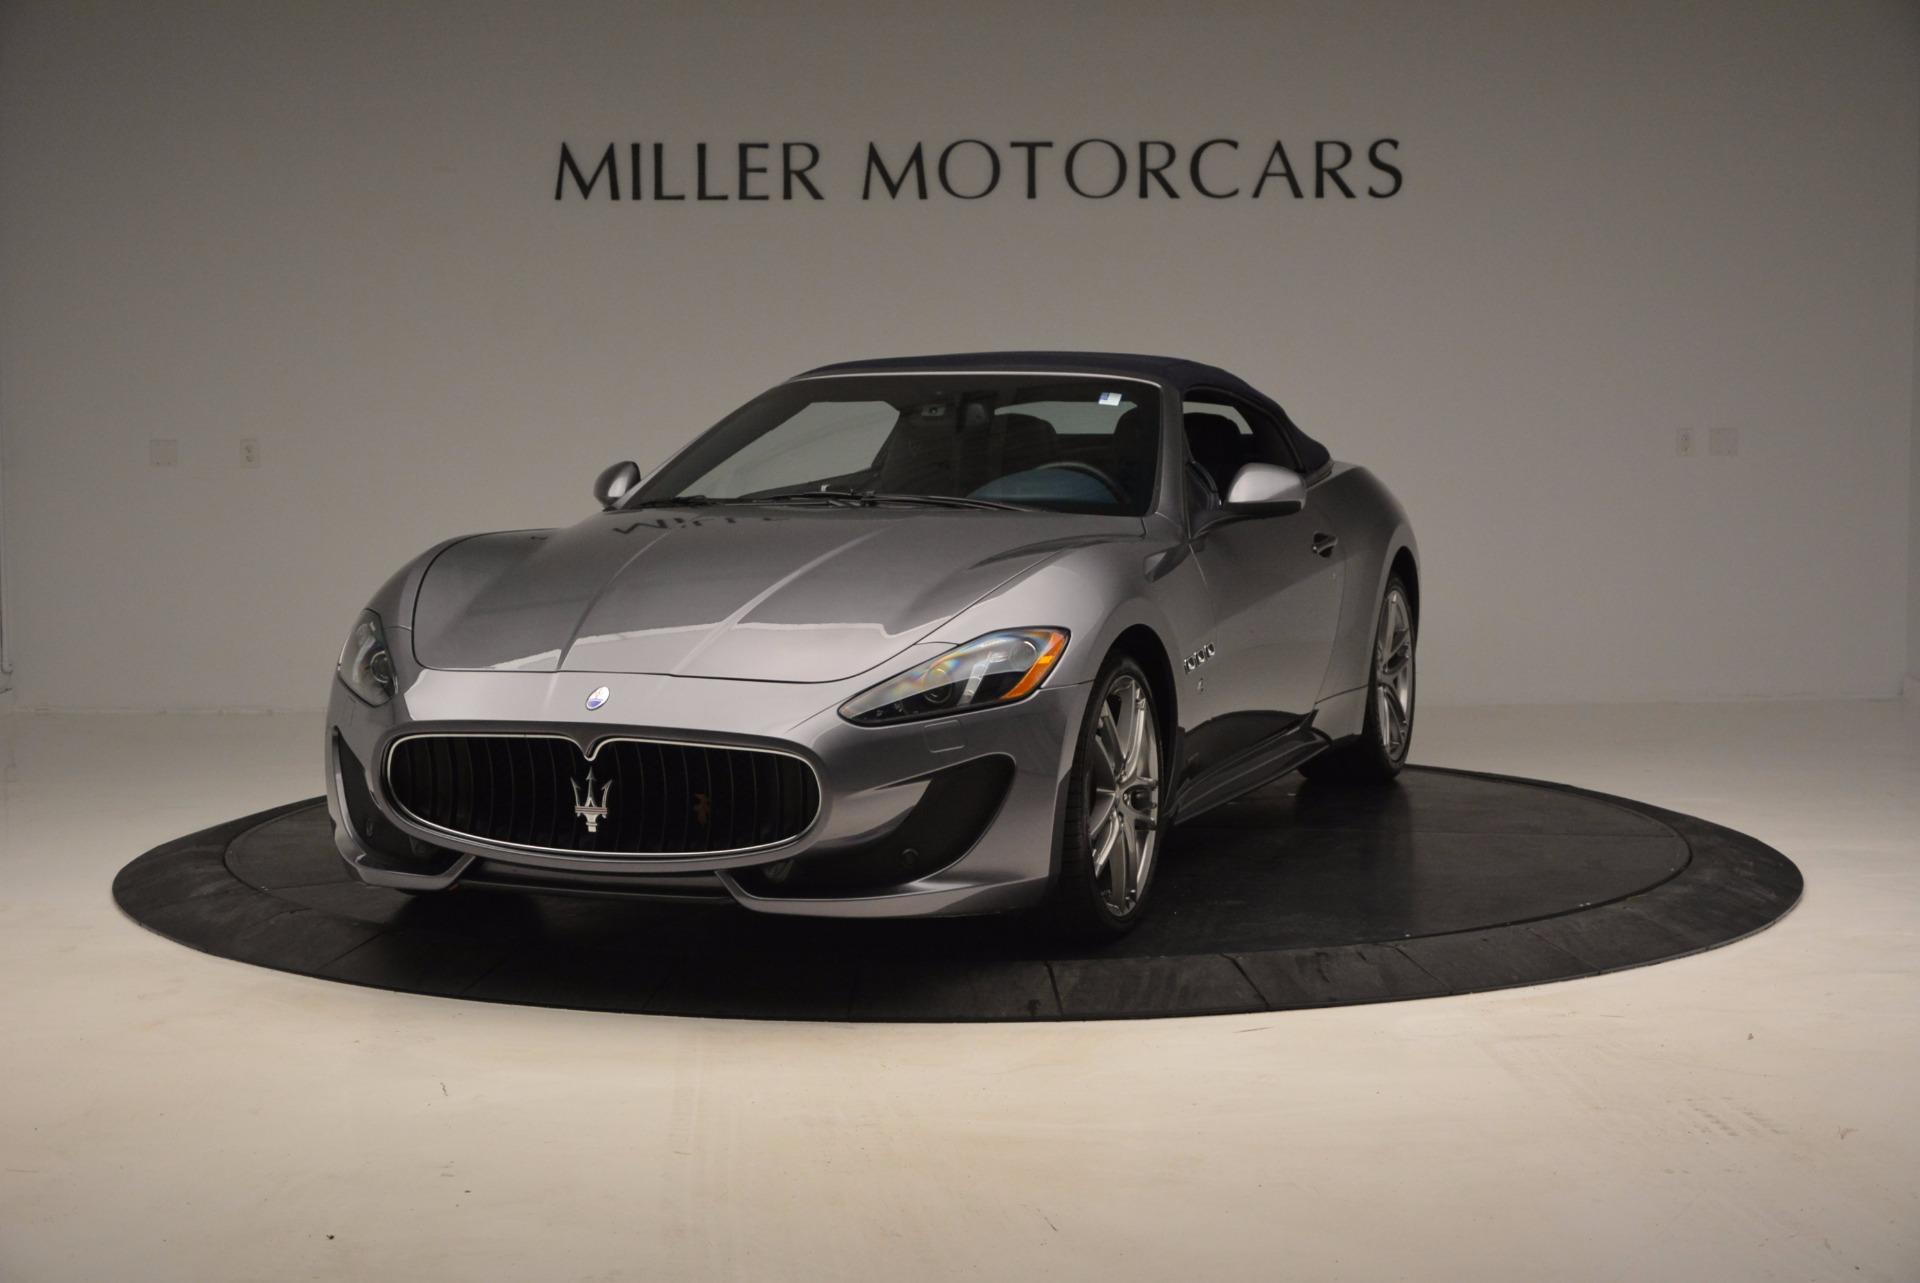 New 2016 Maserati GranTurismo Convertible Sport For Sale In Westport, CT 154_p10